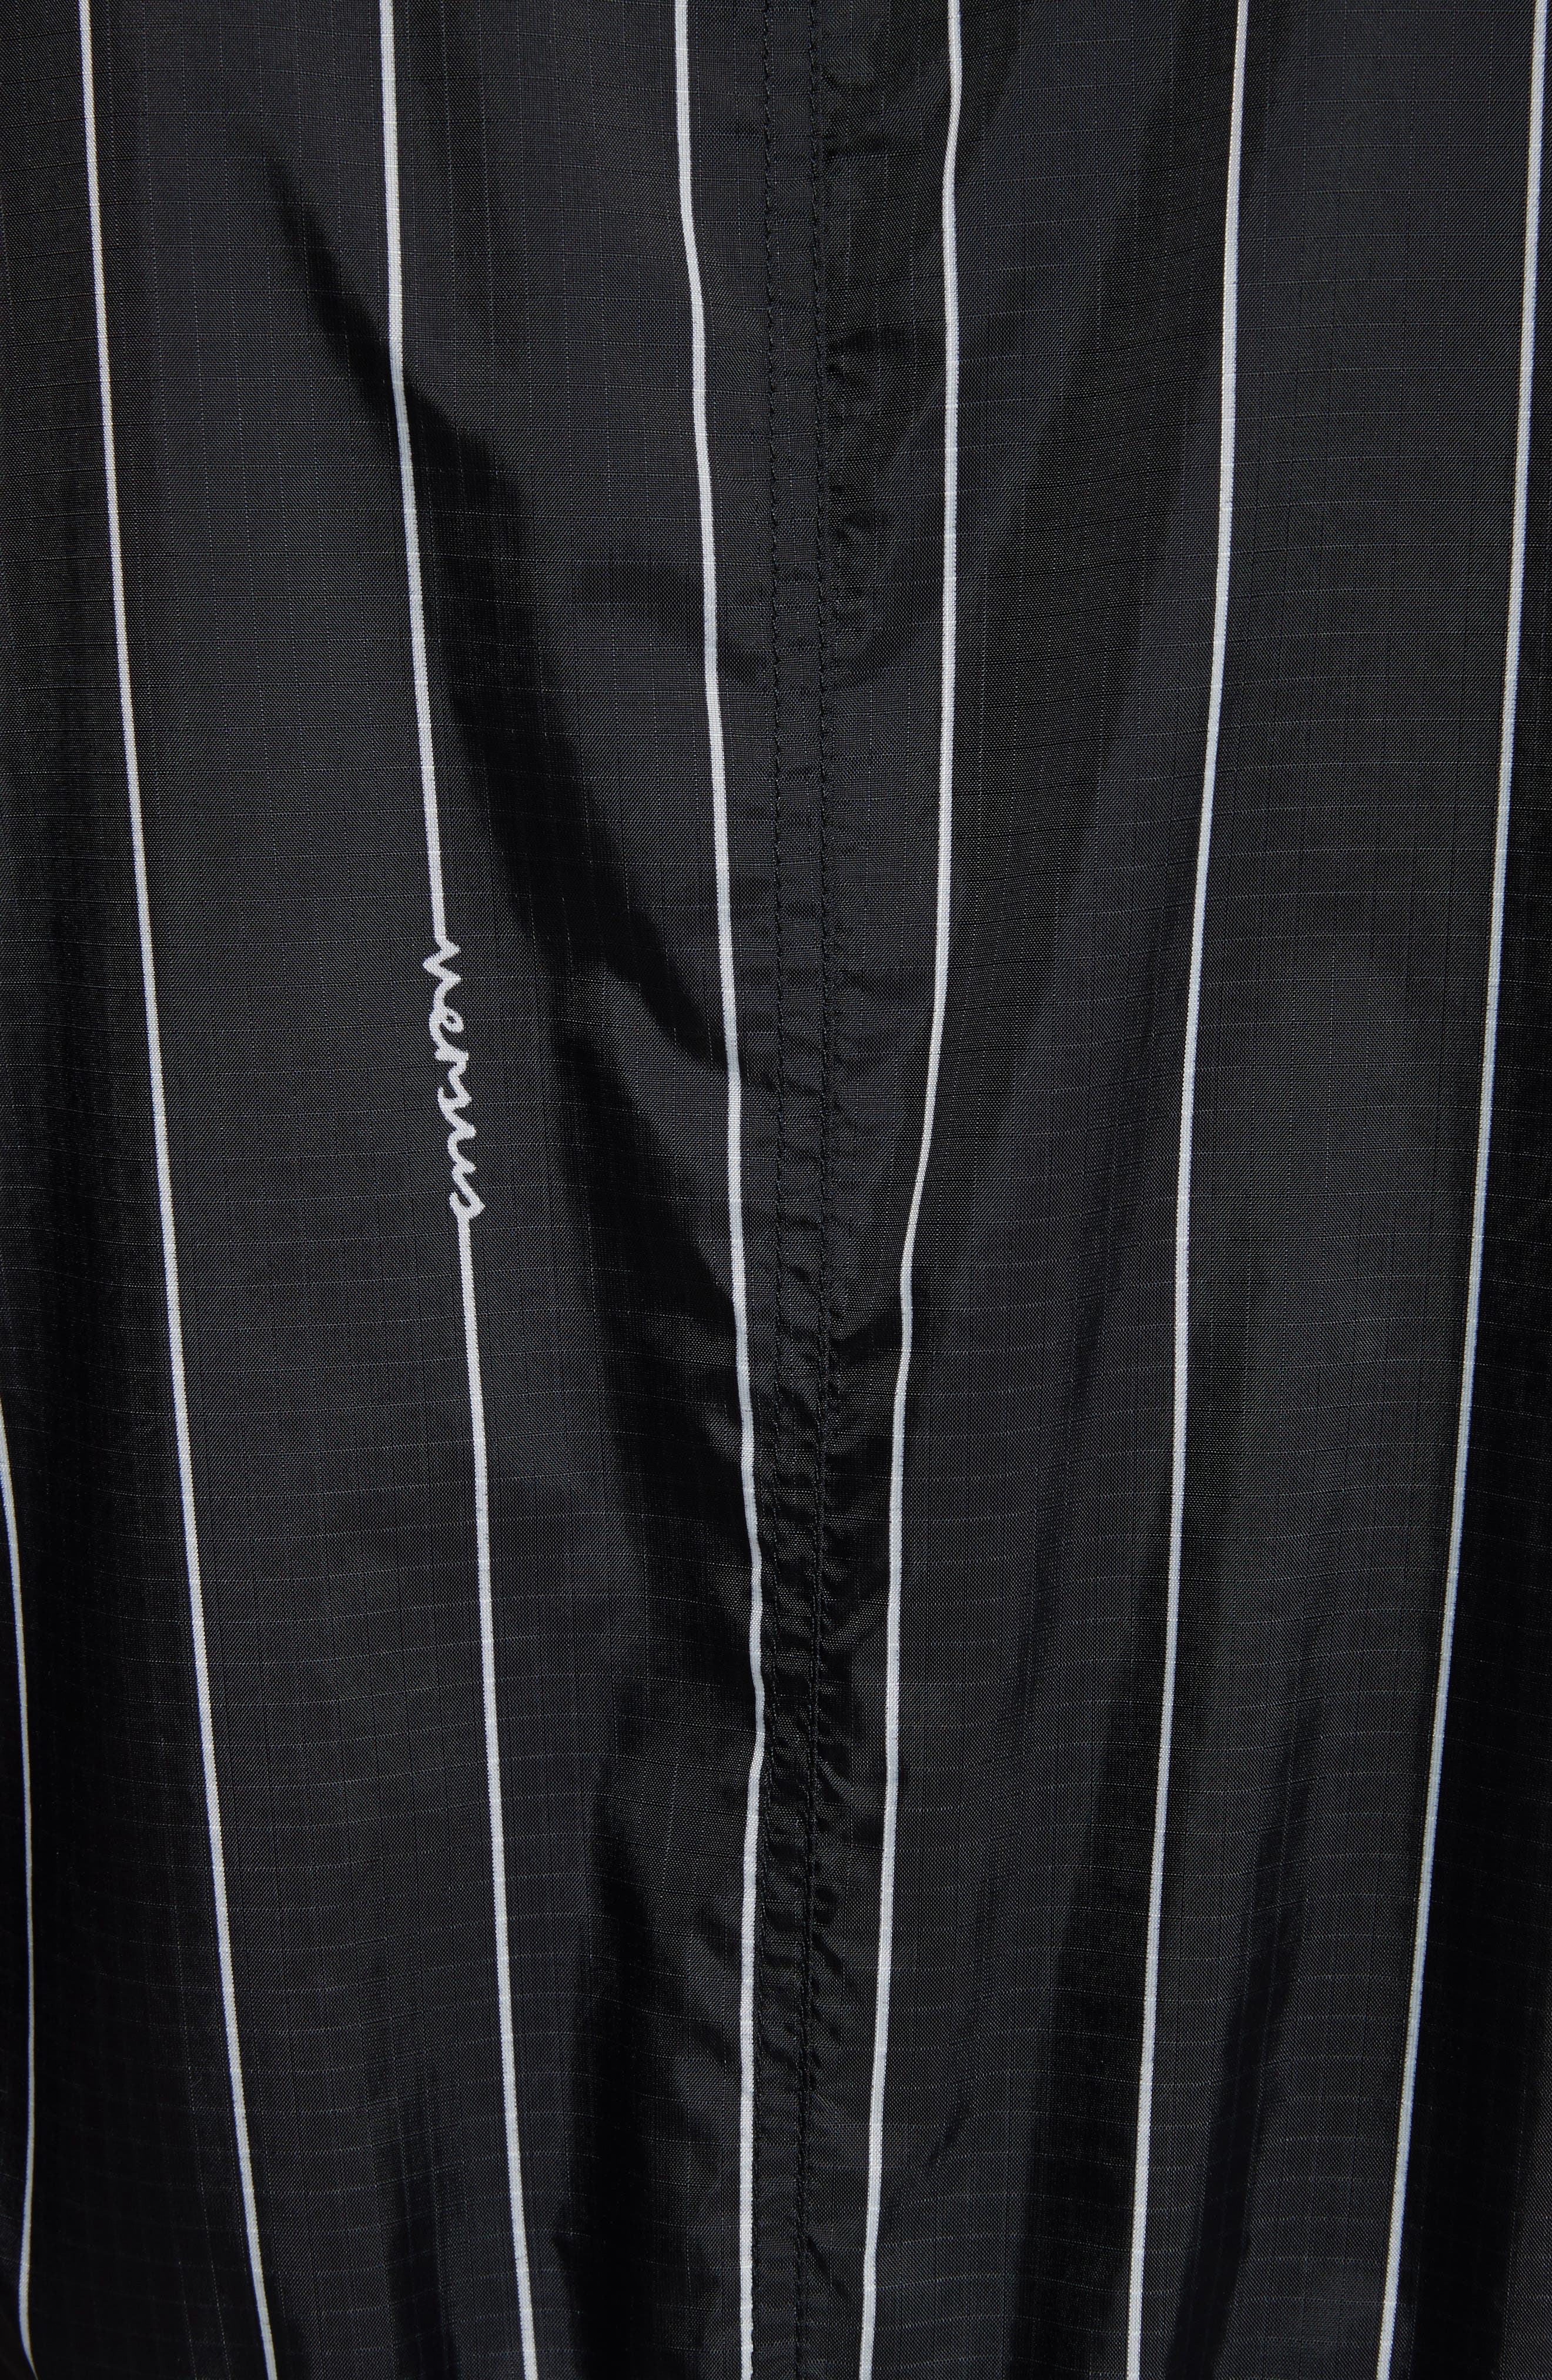 VERSUS by Versace Reversible Pinstripe Bomber Jacket,                             Alternate thumbnail 5, color,                             Black